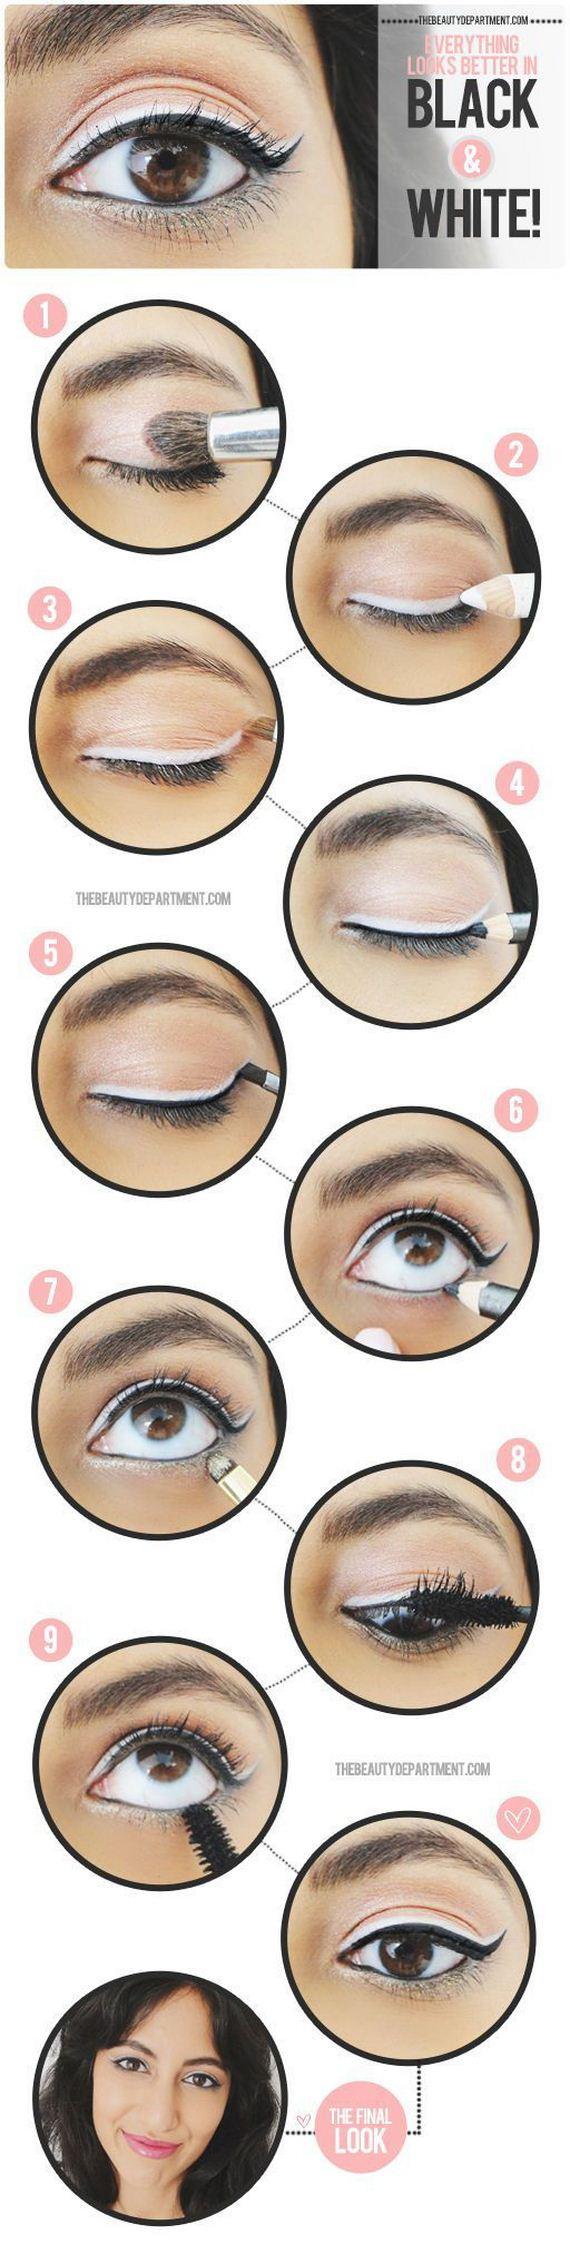 12-Fun-Eyeliner-Tutorials